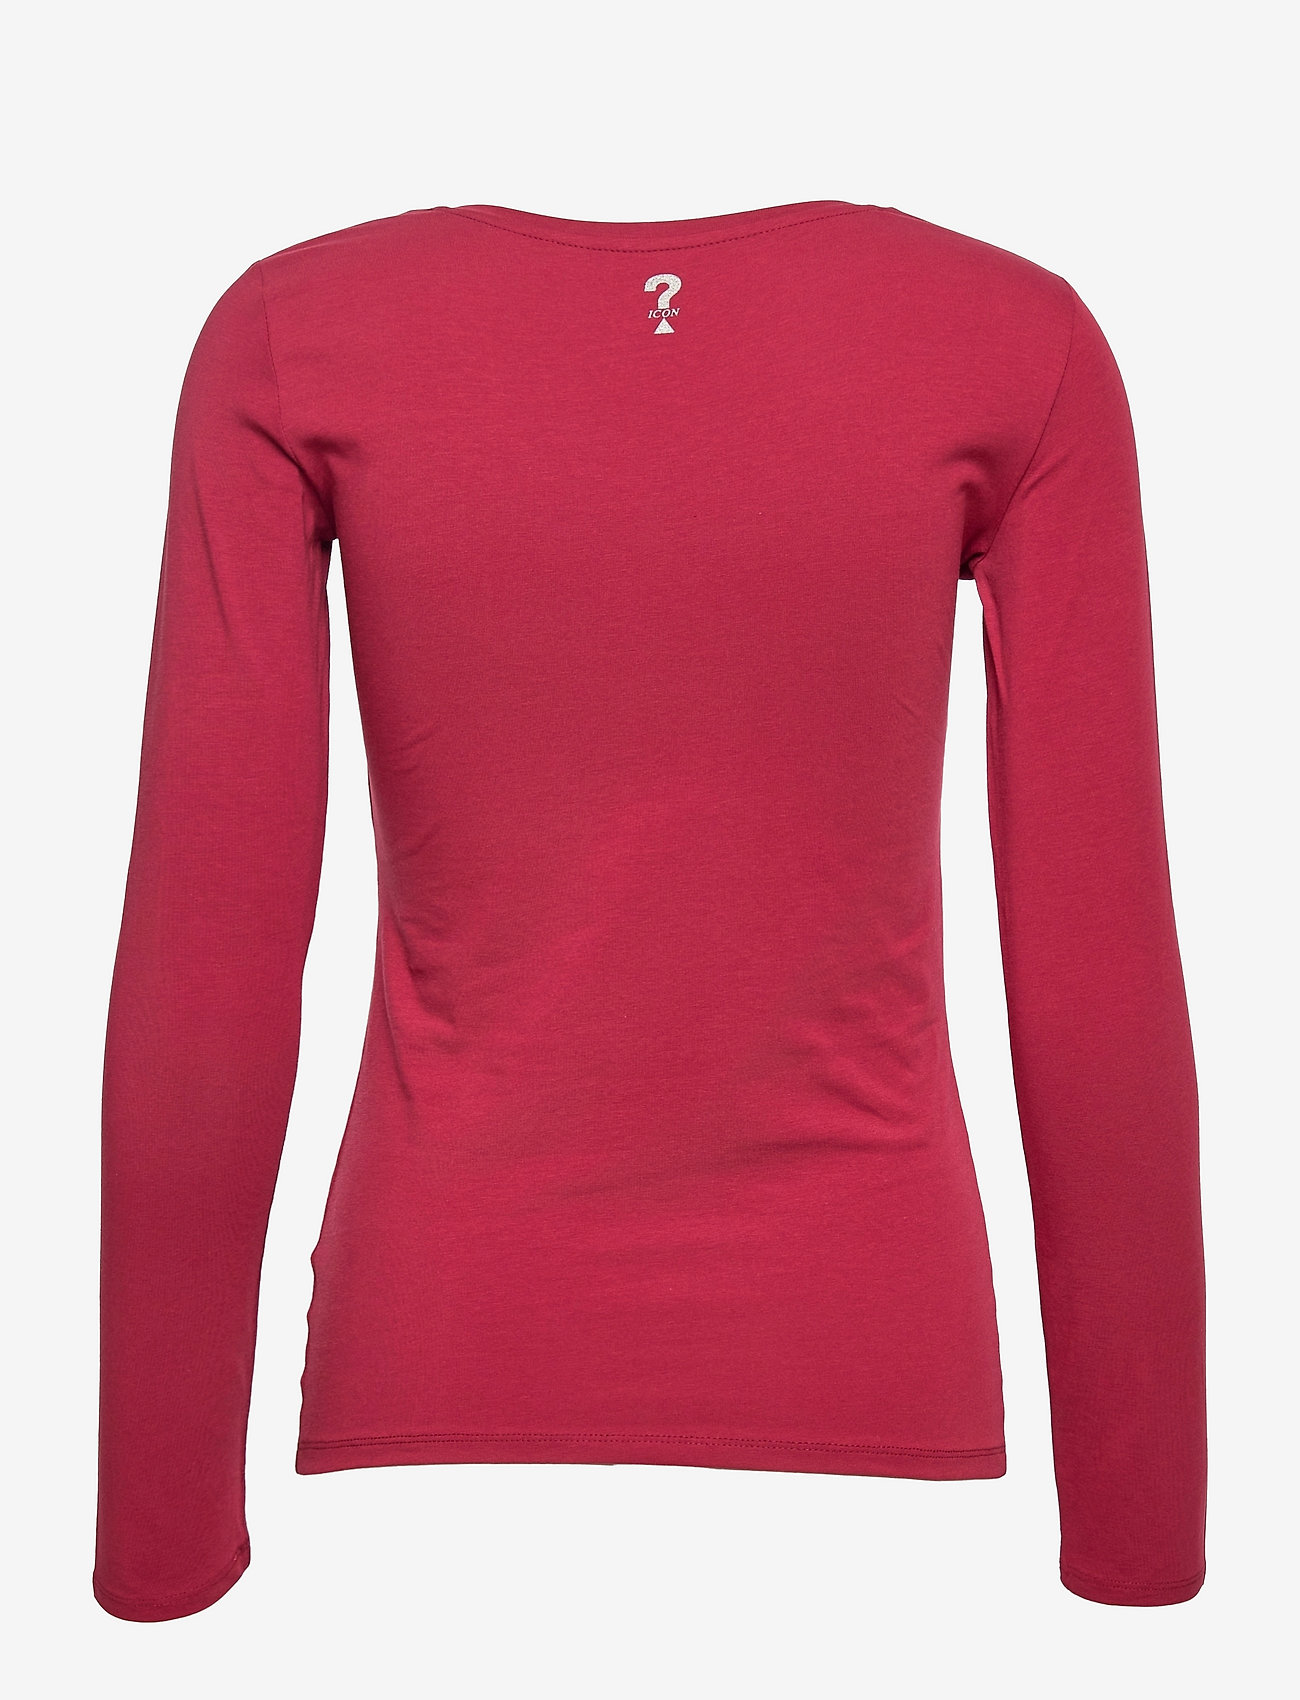 GUESS Jeans - LS CN RAISA TEE - långärmade toppar - beet juice red - 1